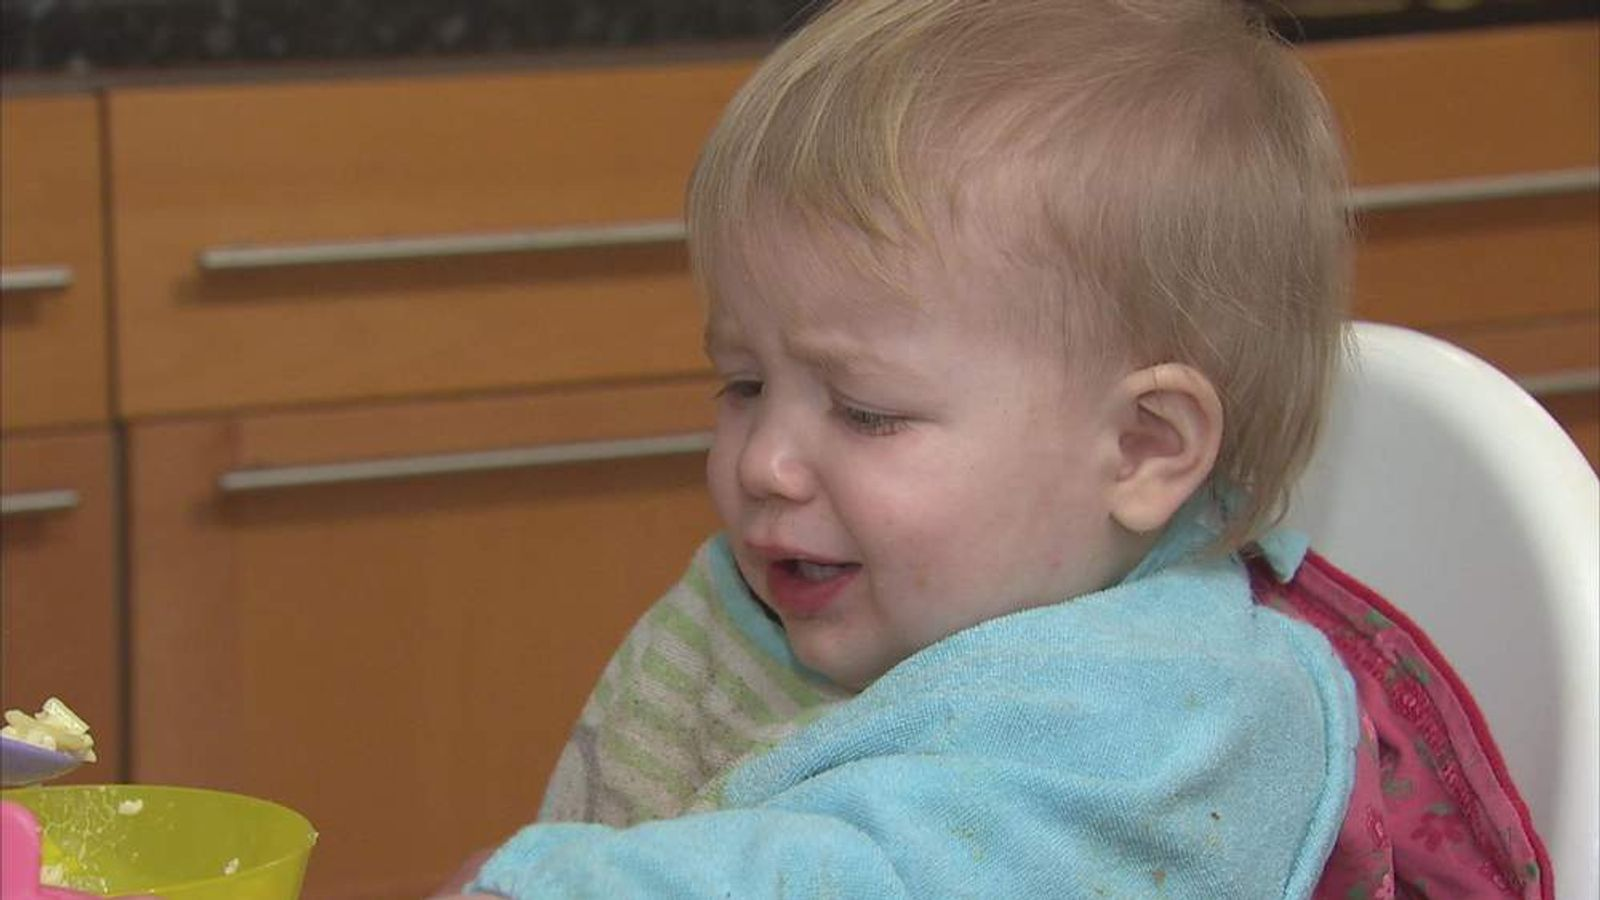 A toddler refusing food